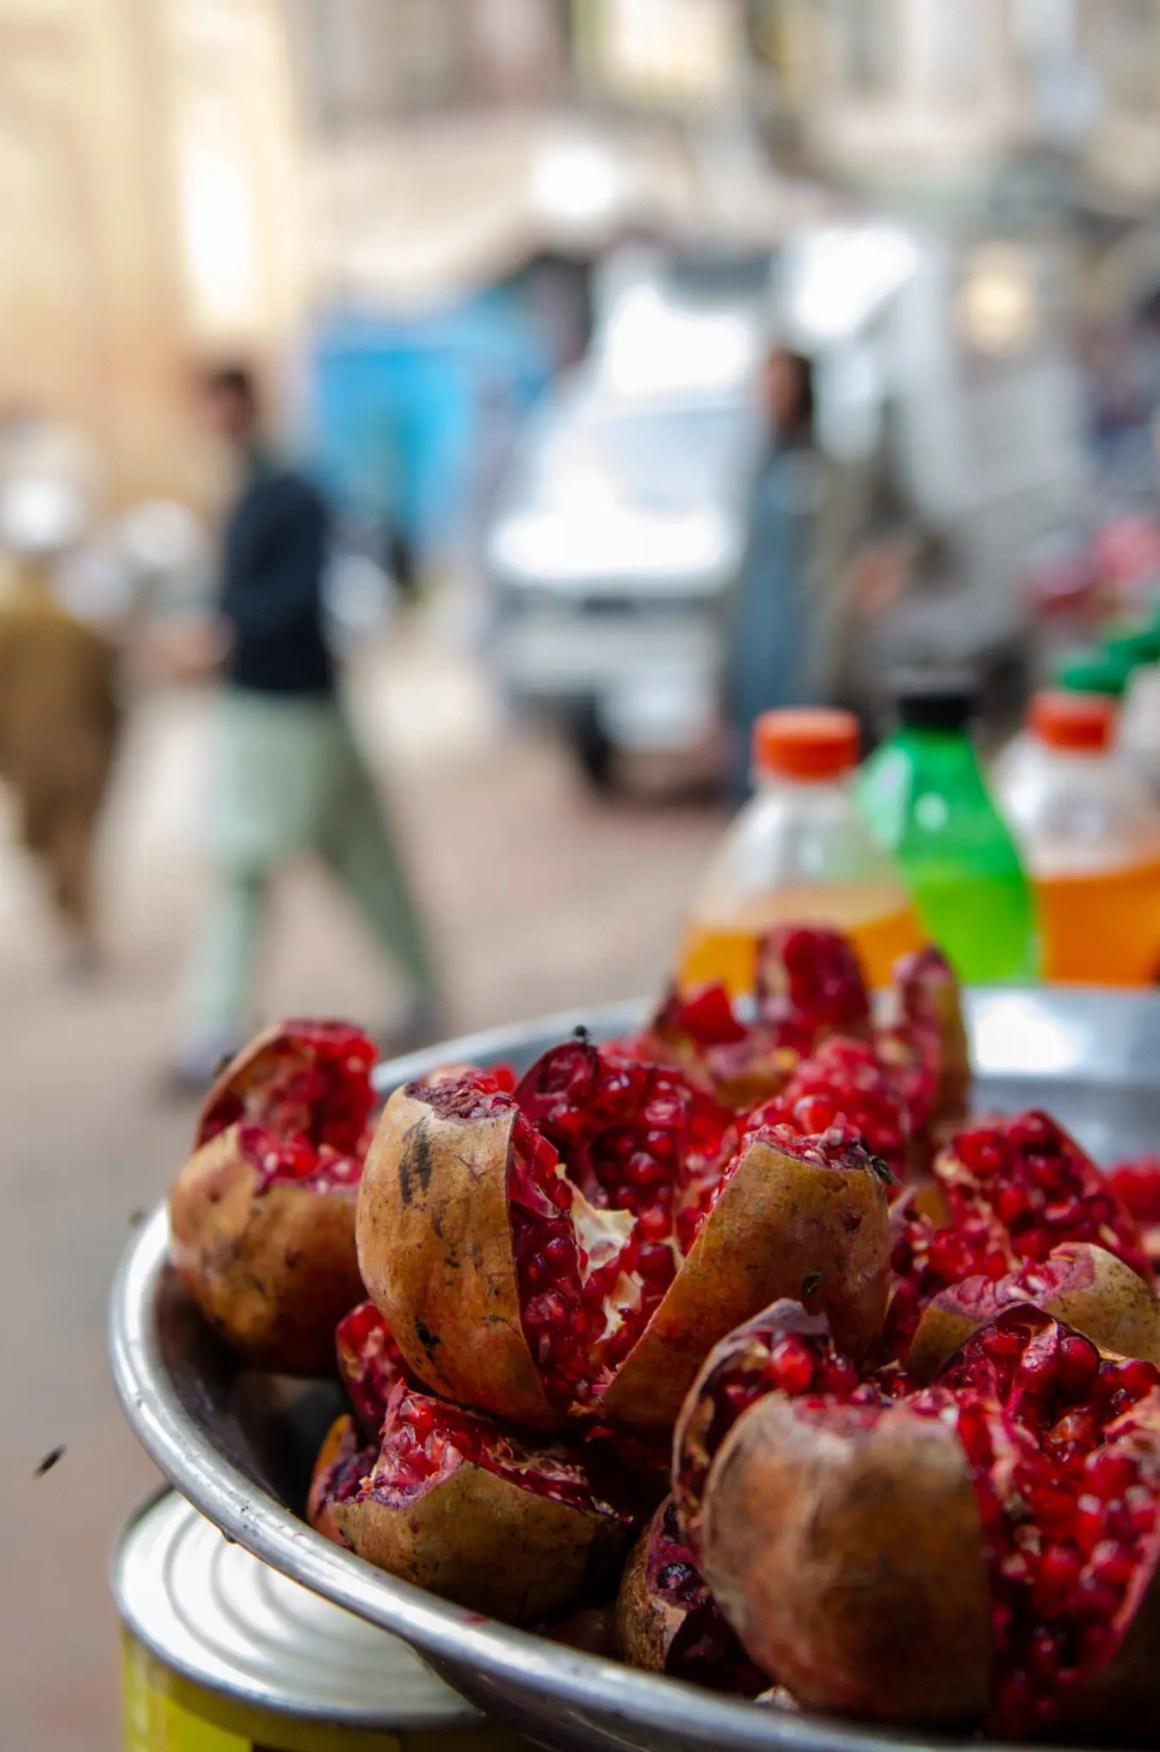 Granaatappel in Pakistan